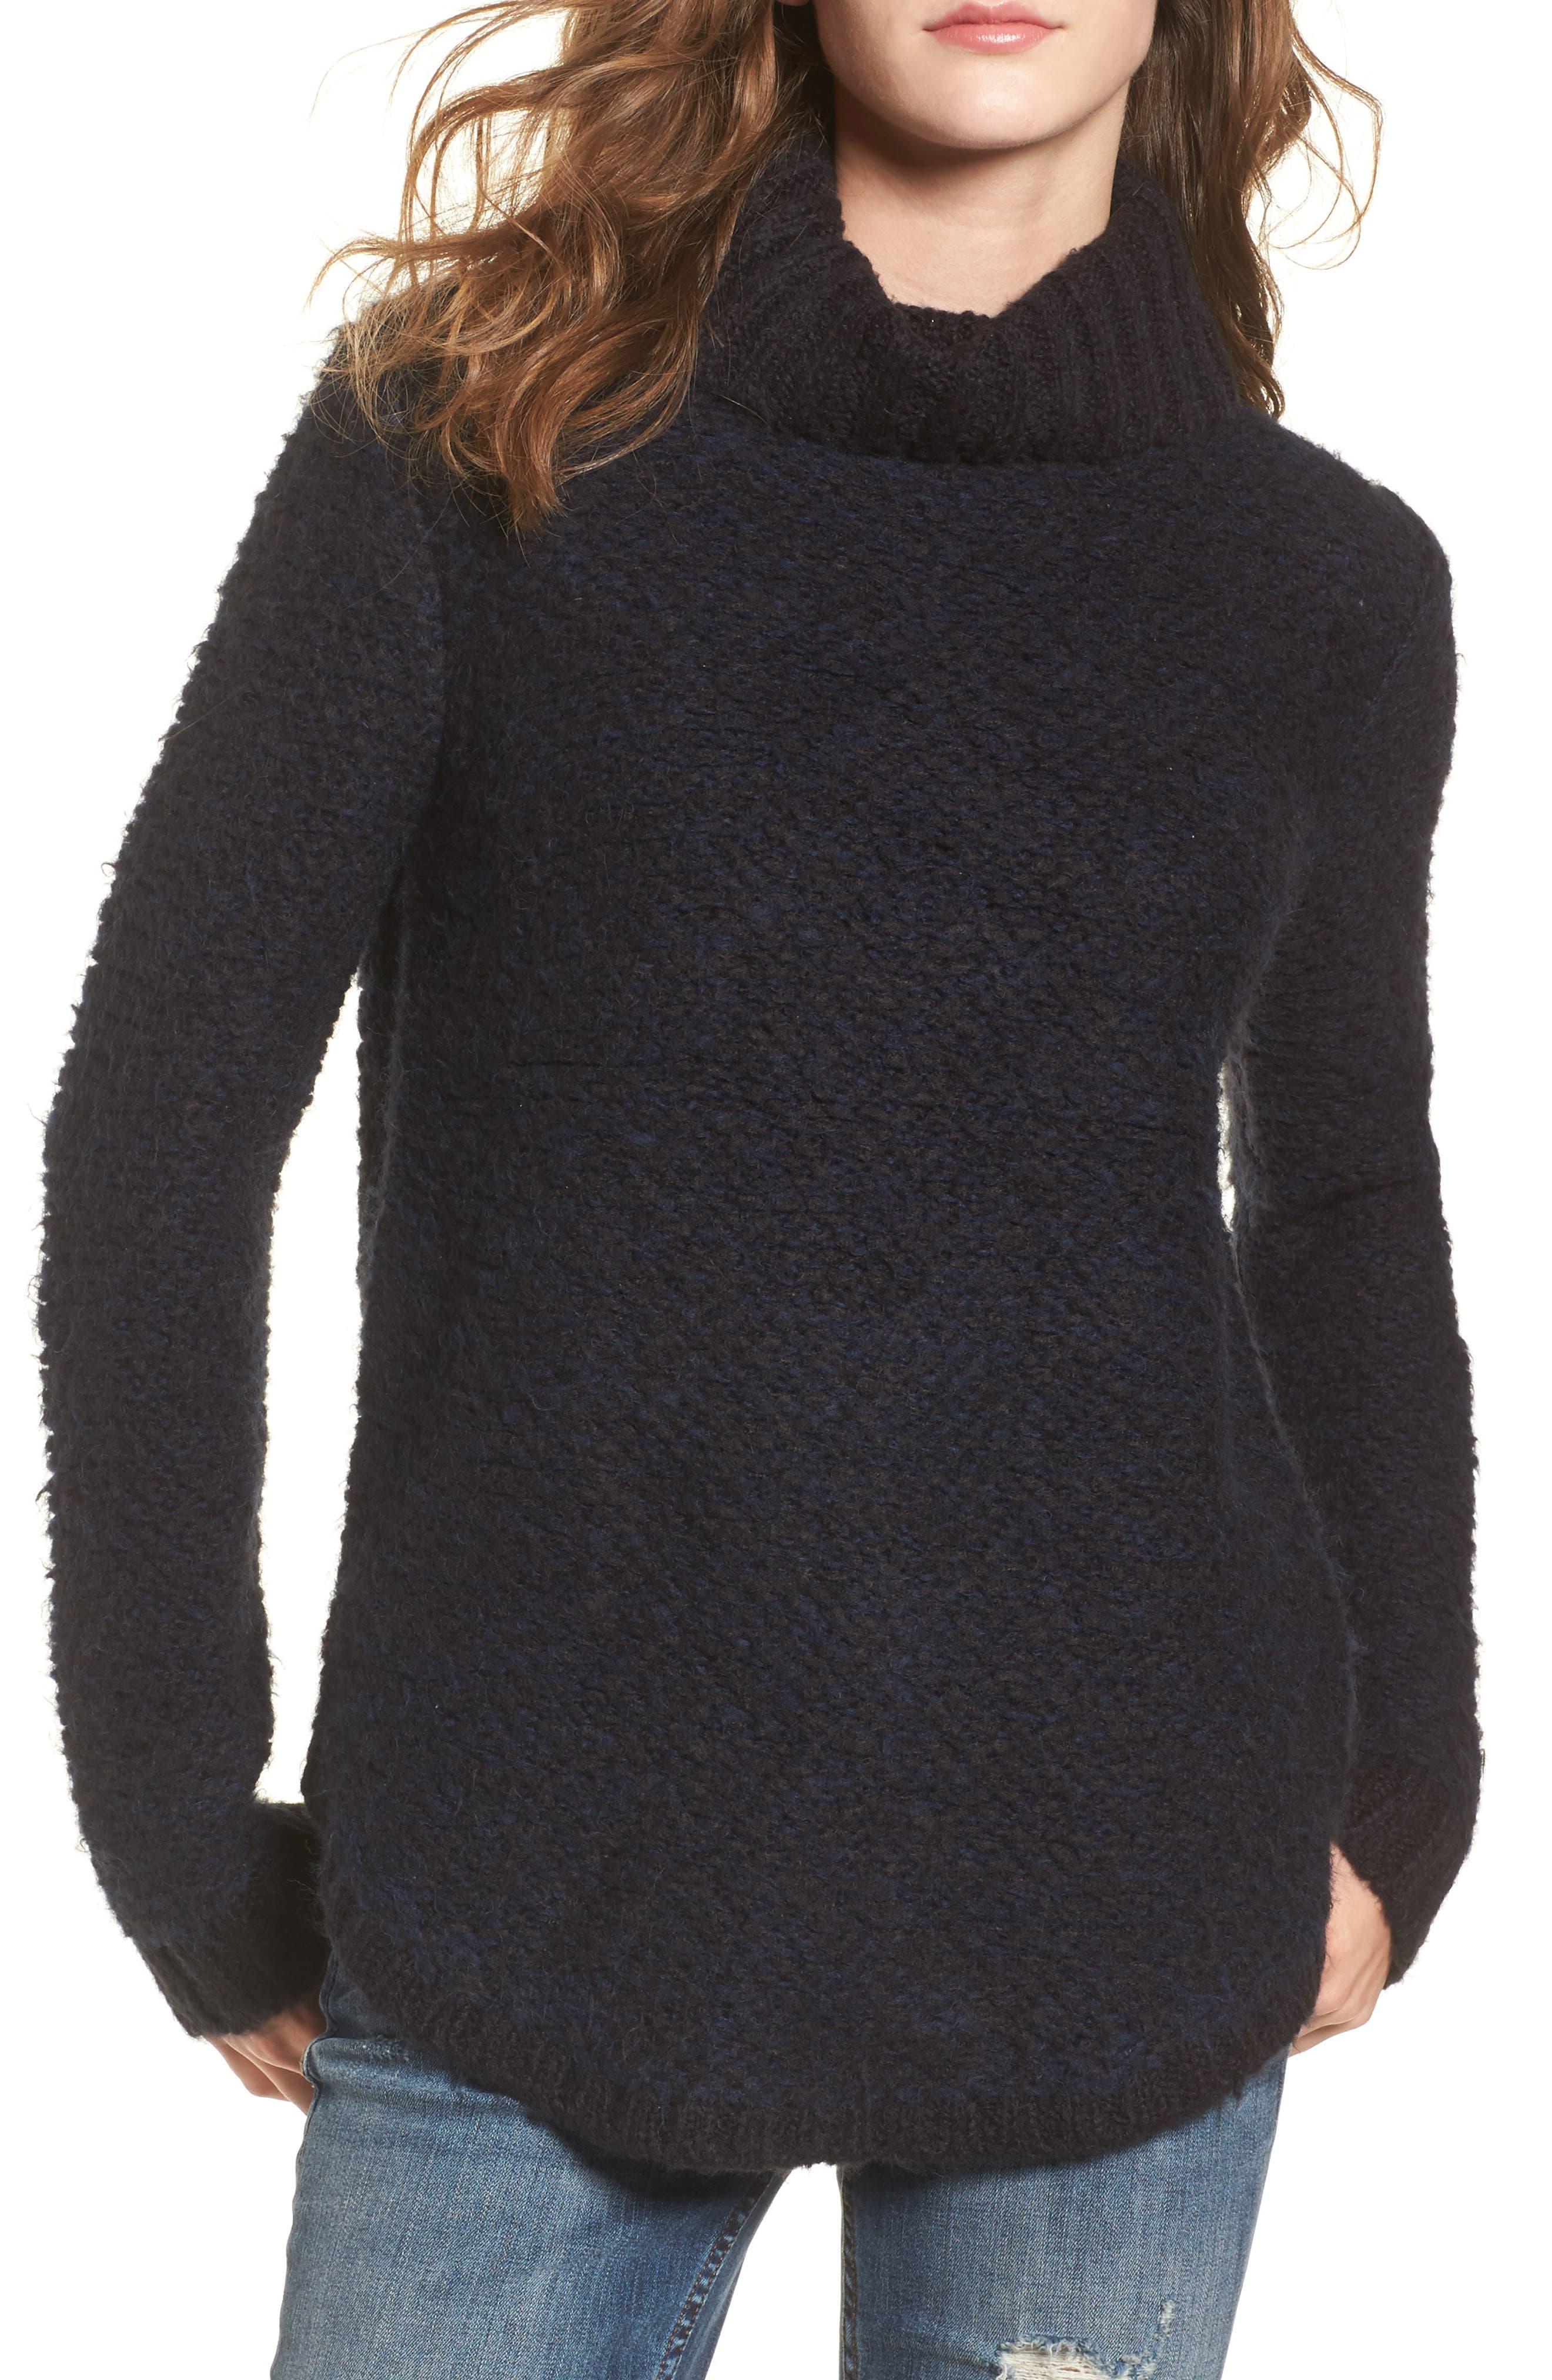 Kinks Turtleneck Sweater,                         Main,                         color,